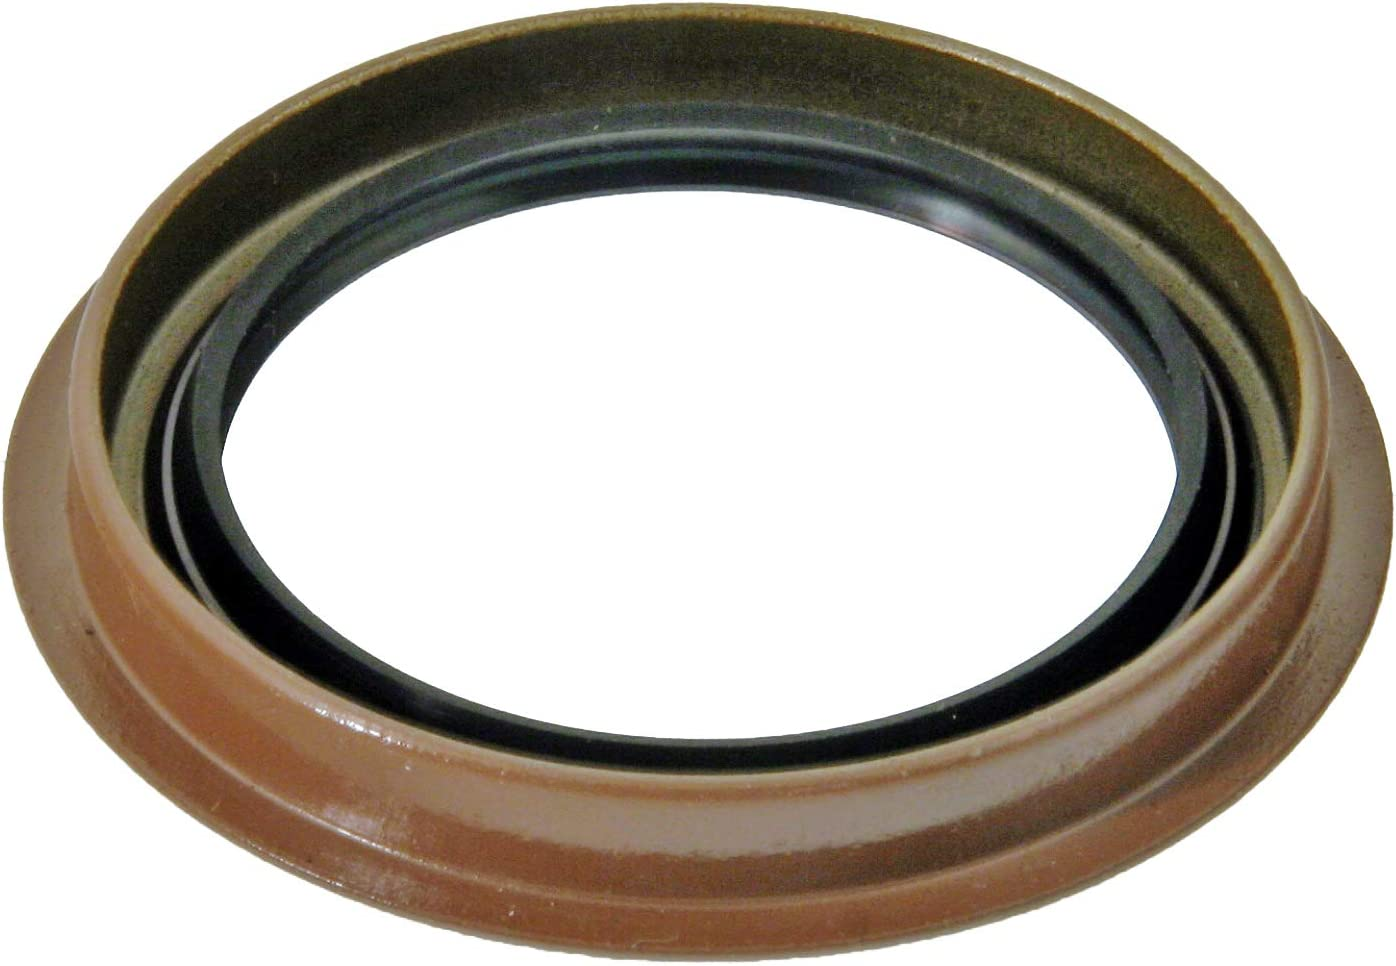 ACDelco 6815 Advantage Crankshaft Front Oil Seal